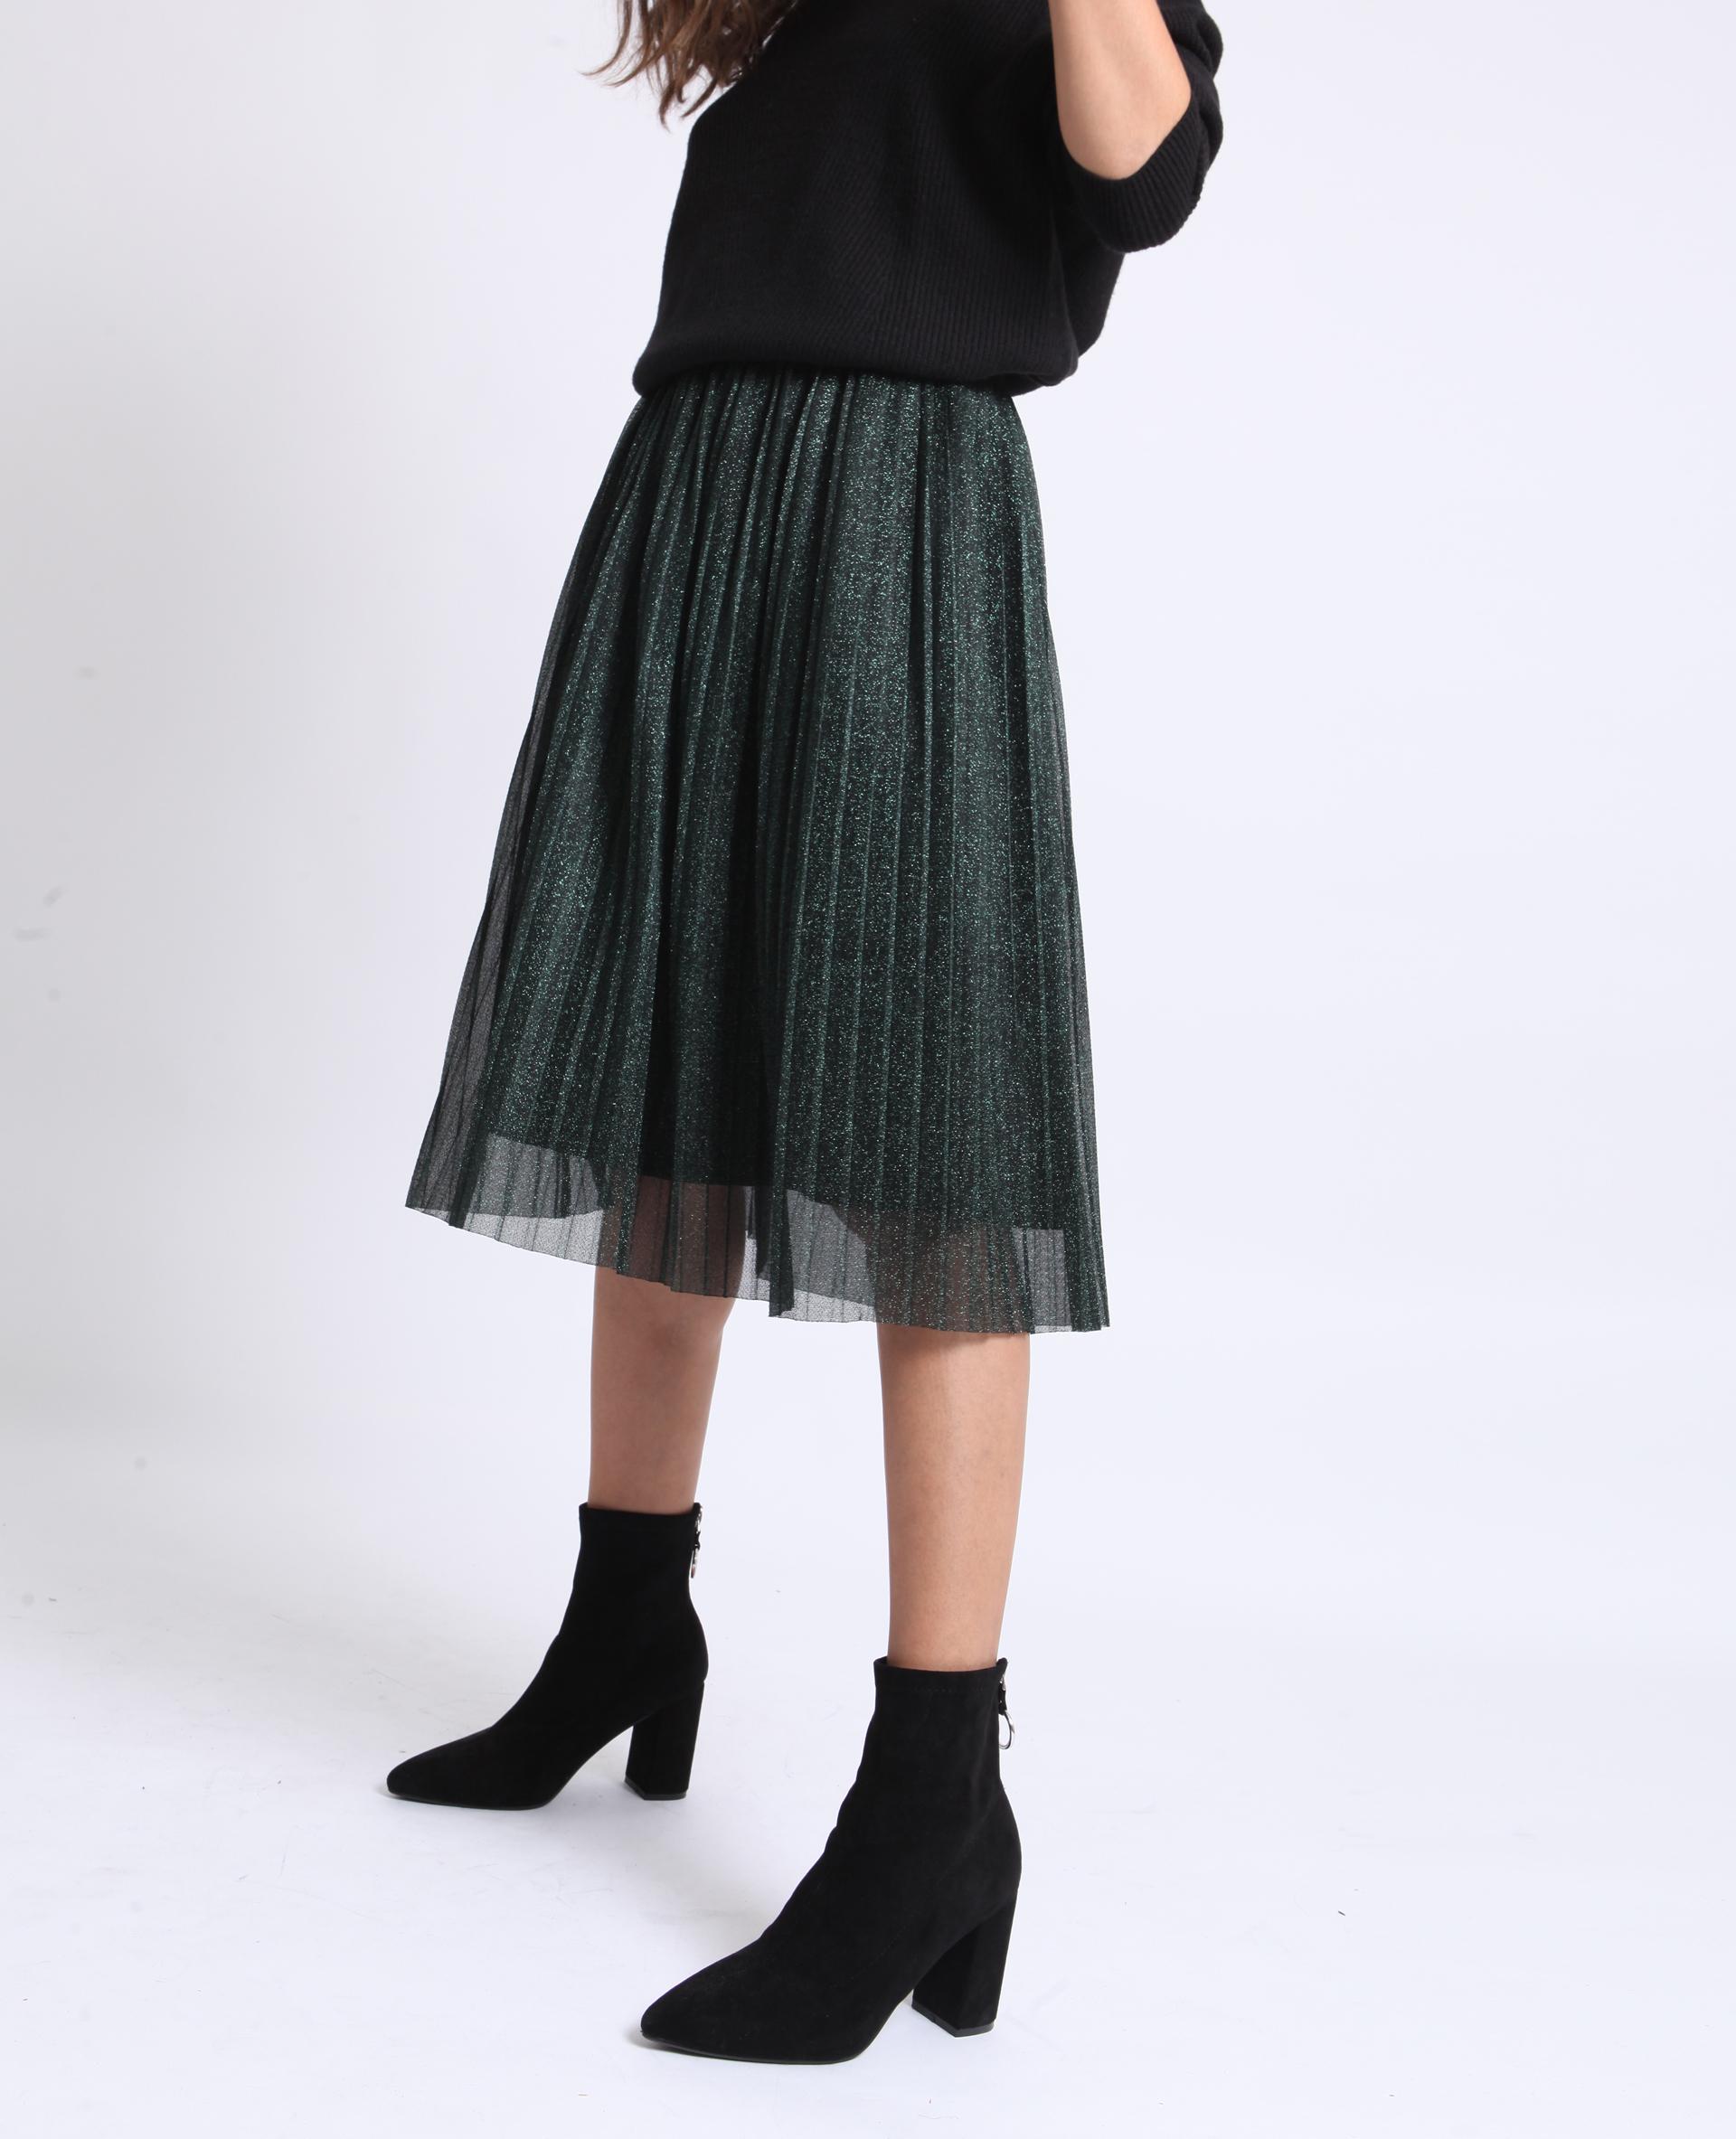 Calzedonia Femme Collants Semi-opaques 50 Deniers Toucher Soyeux 8228d8ef15c